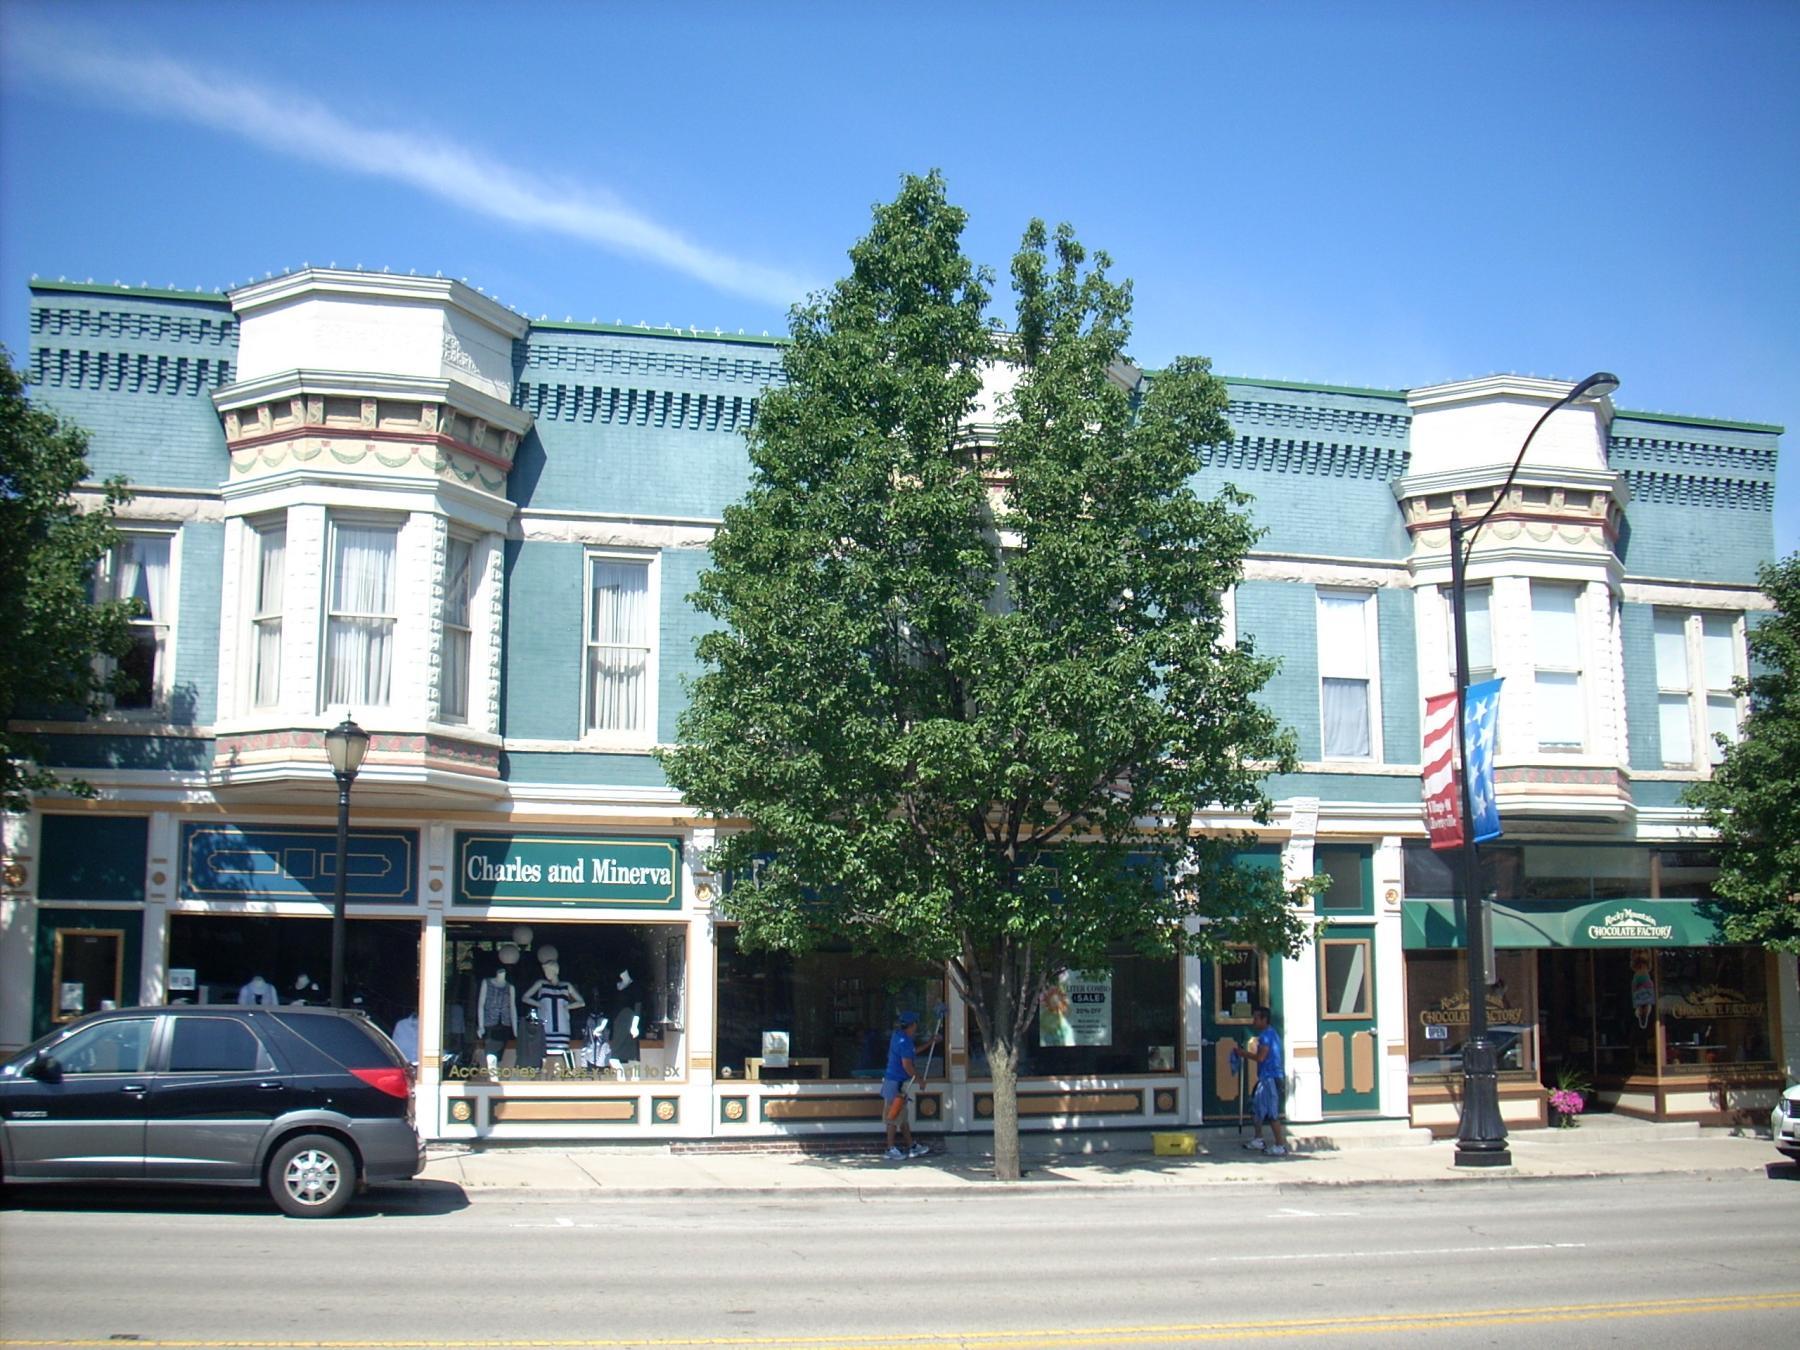 535-541 N. Milwaukee Avenue, circa 2006